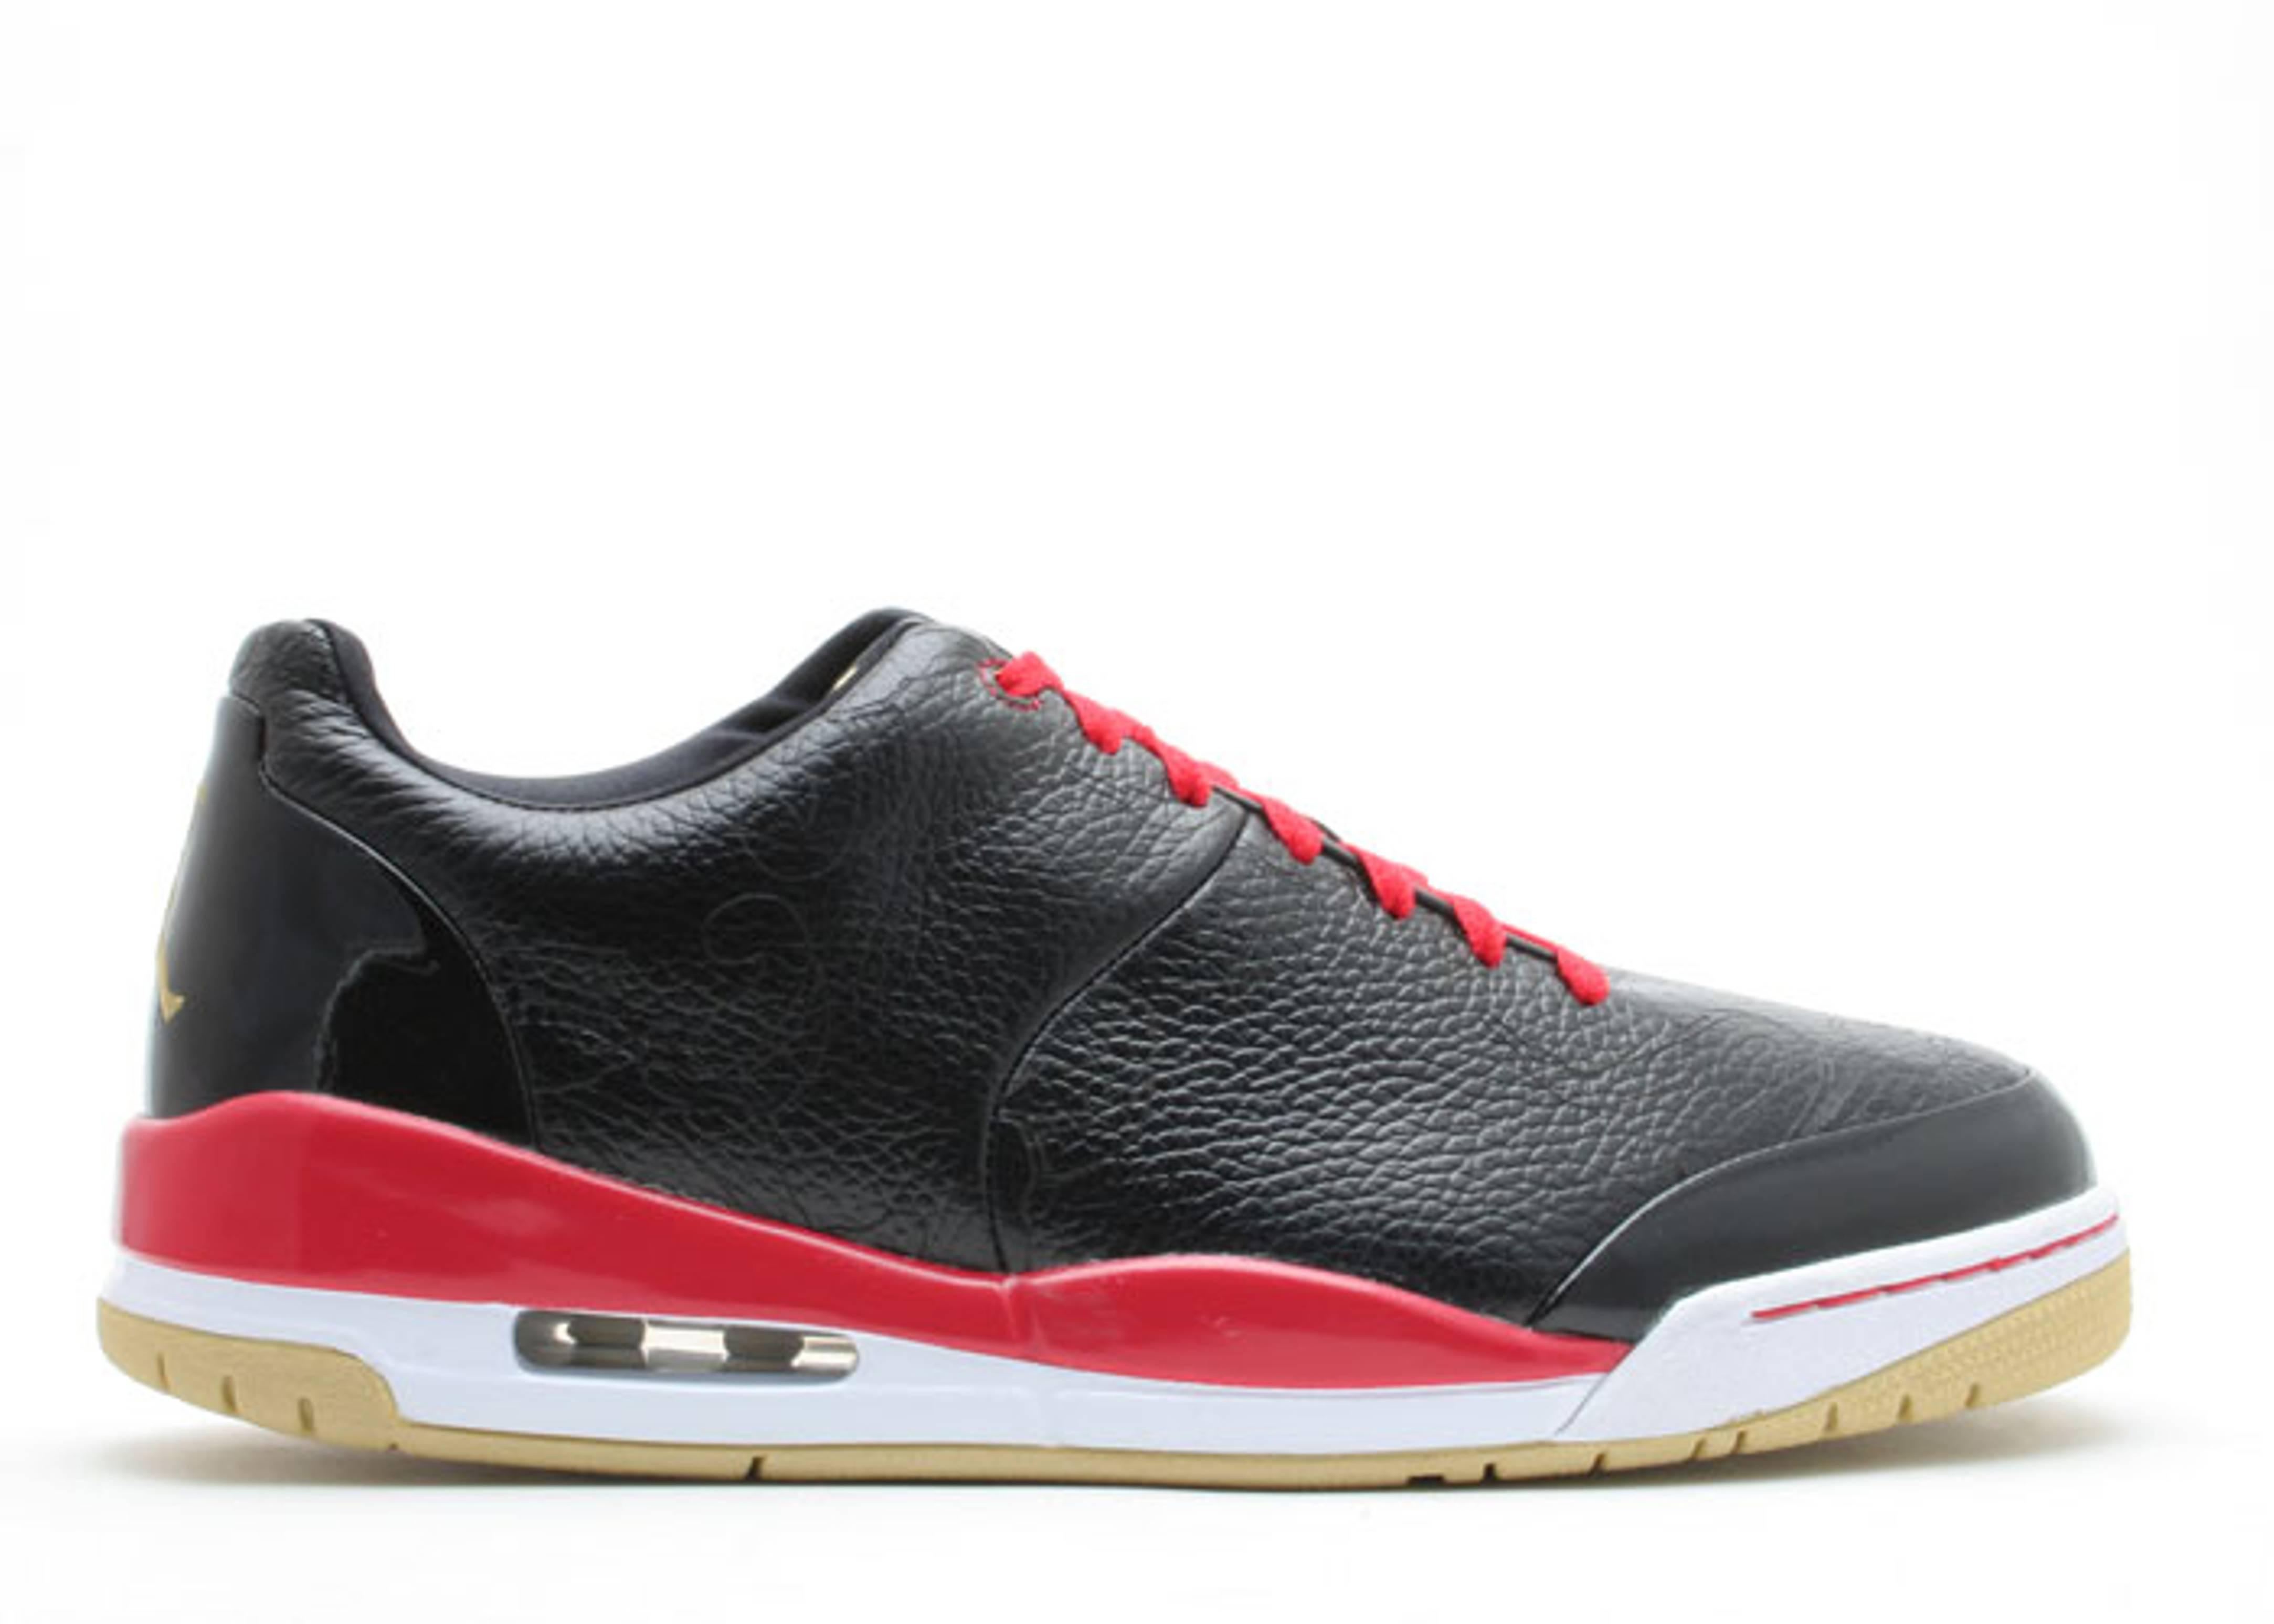 d5f3dfa1b80 Jordan 23 Classic Xq - Air Jordan - 316913 071 - black/gold dust ...